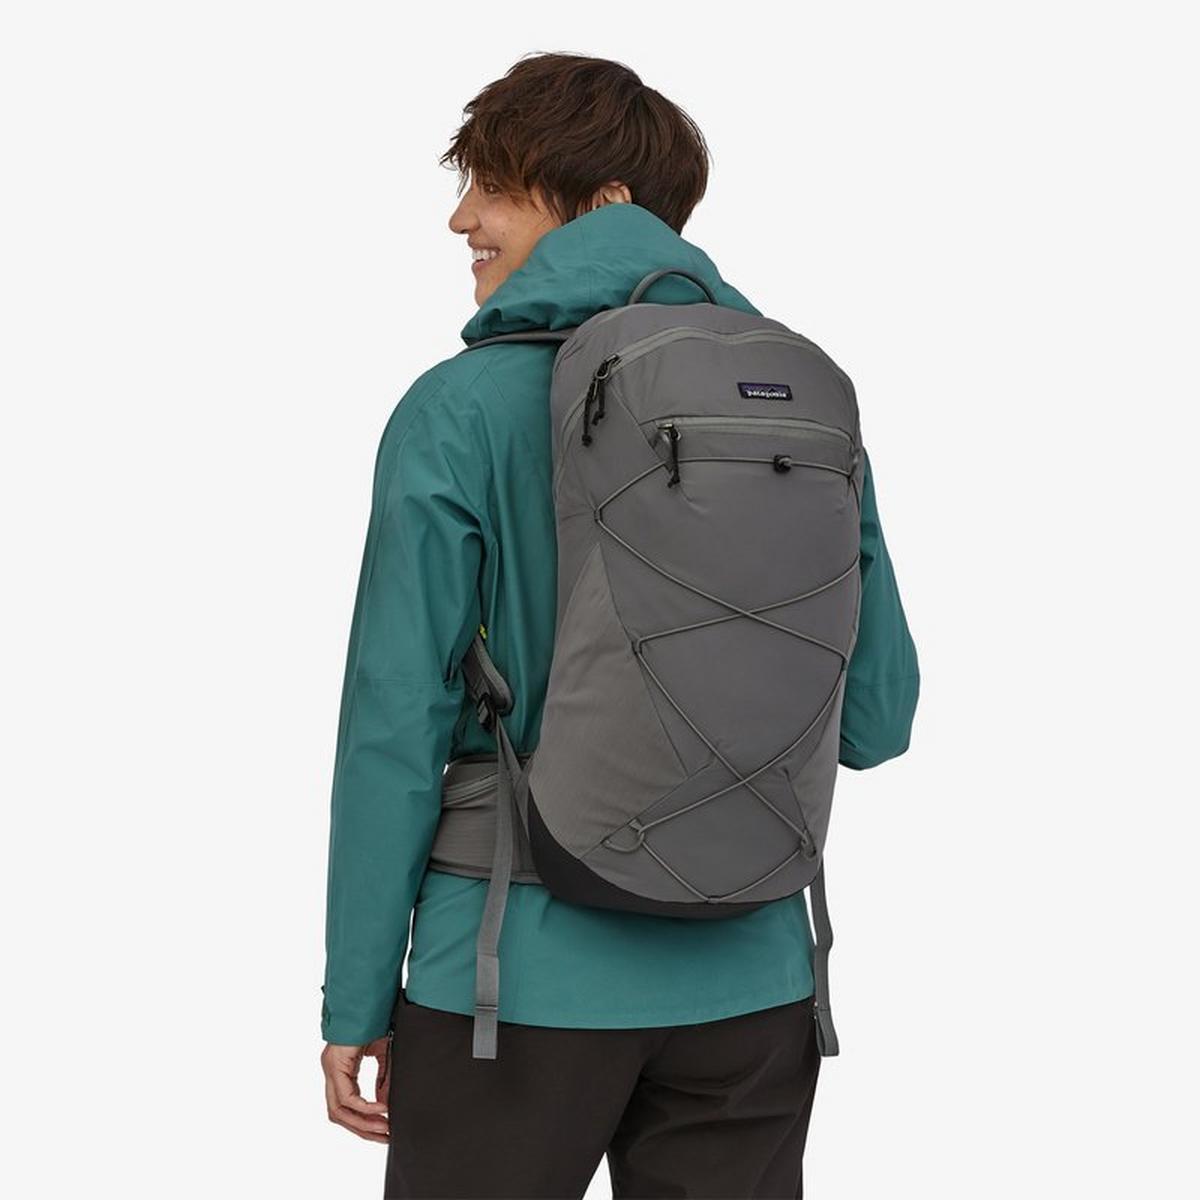 Patagonia Altvia Pack - 22L - Noble Grey